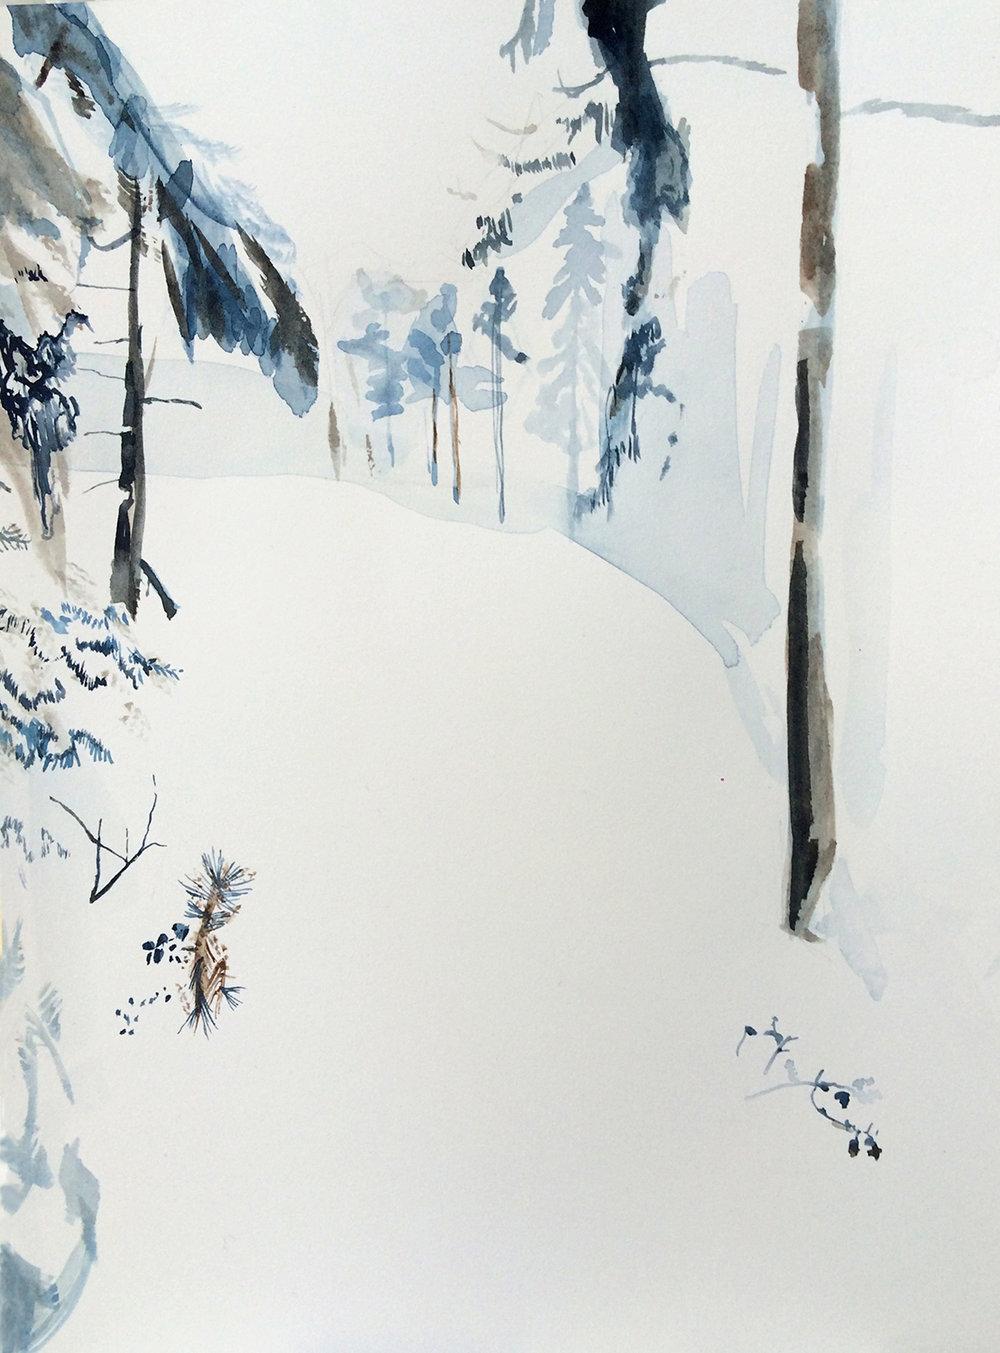 snowski2calderaweb.jpg